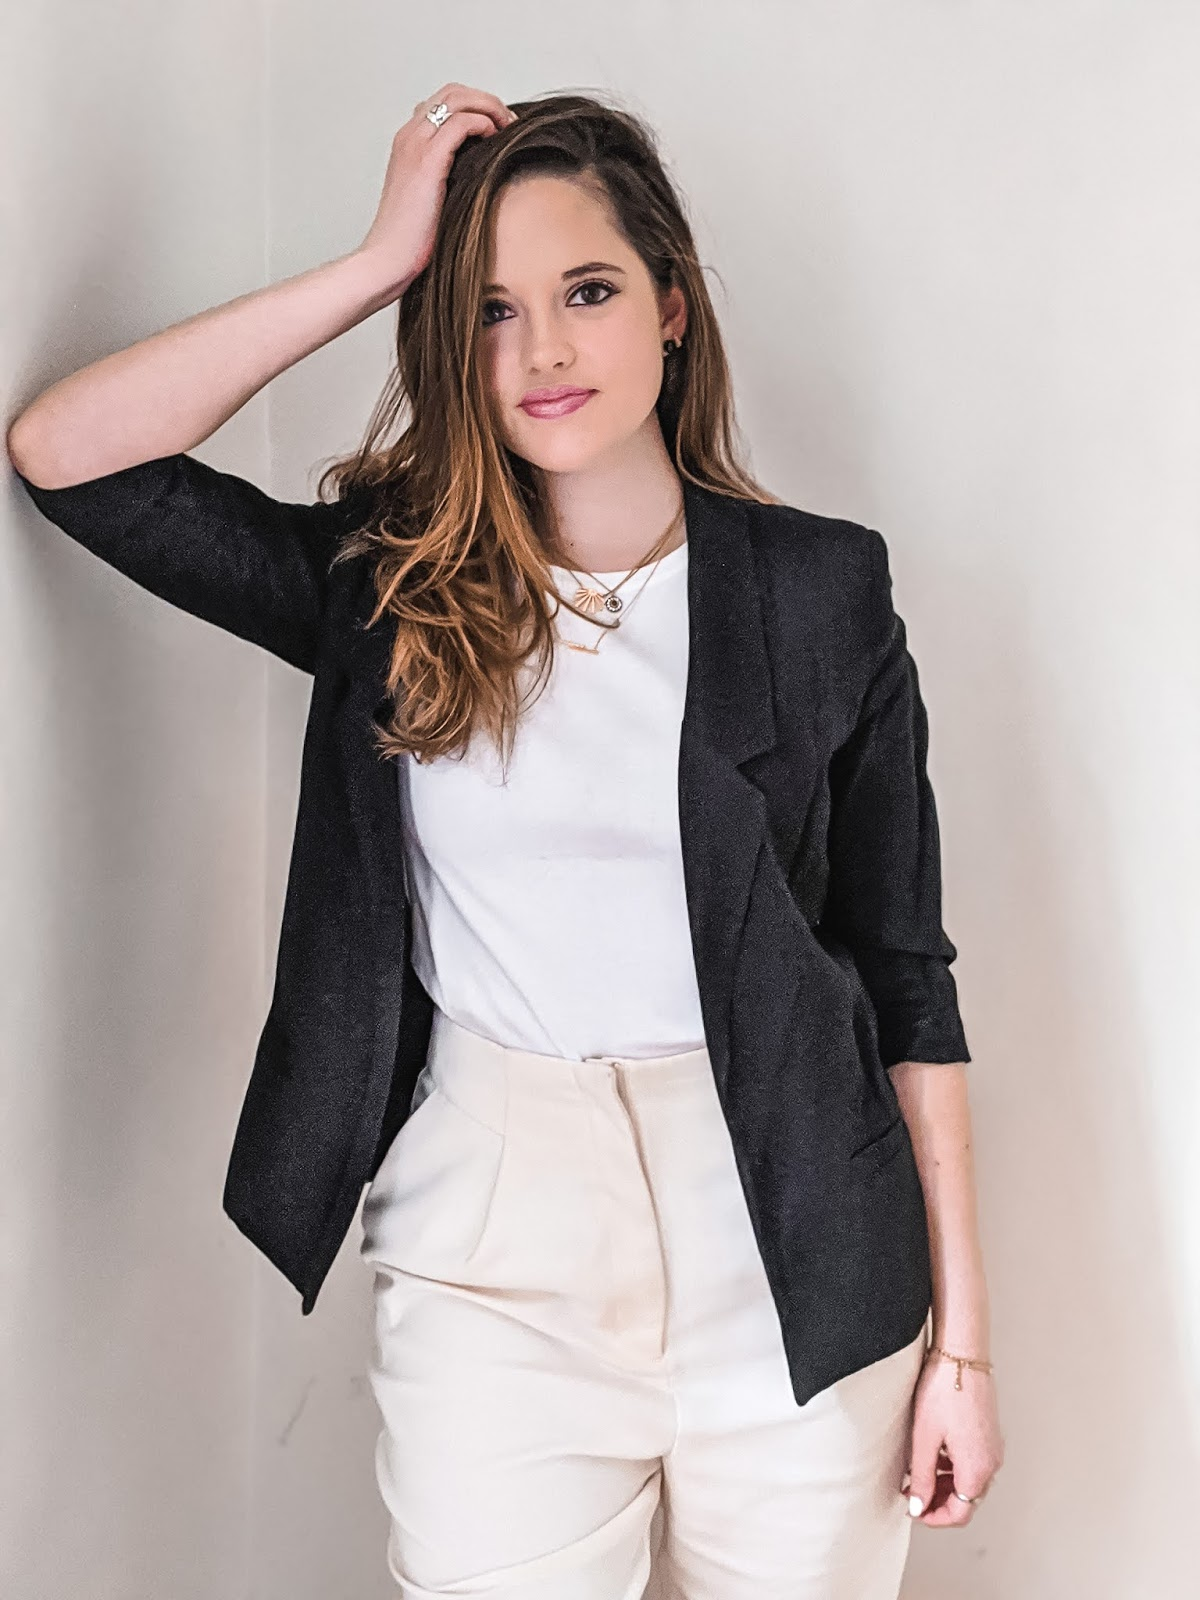 Nyc popsugar fashion editor Kathleen Harper